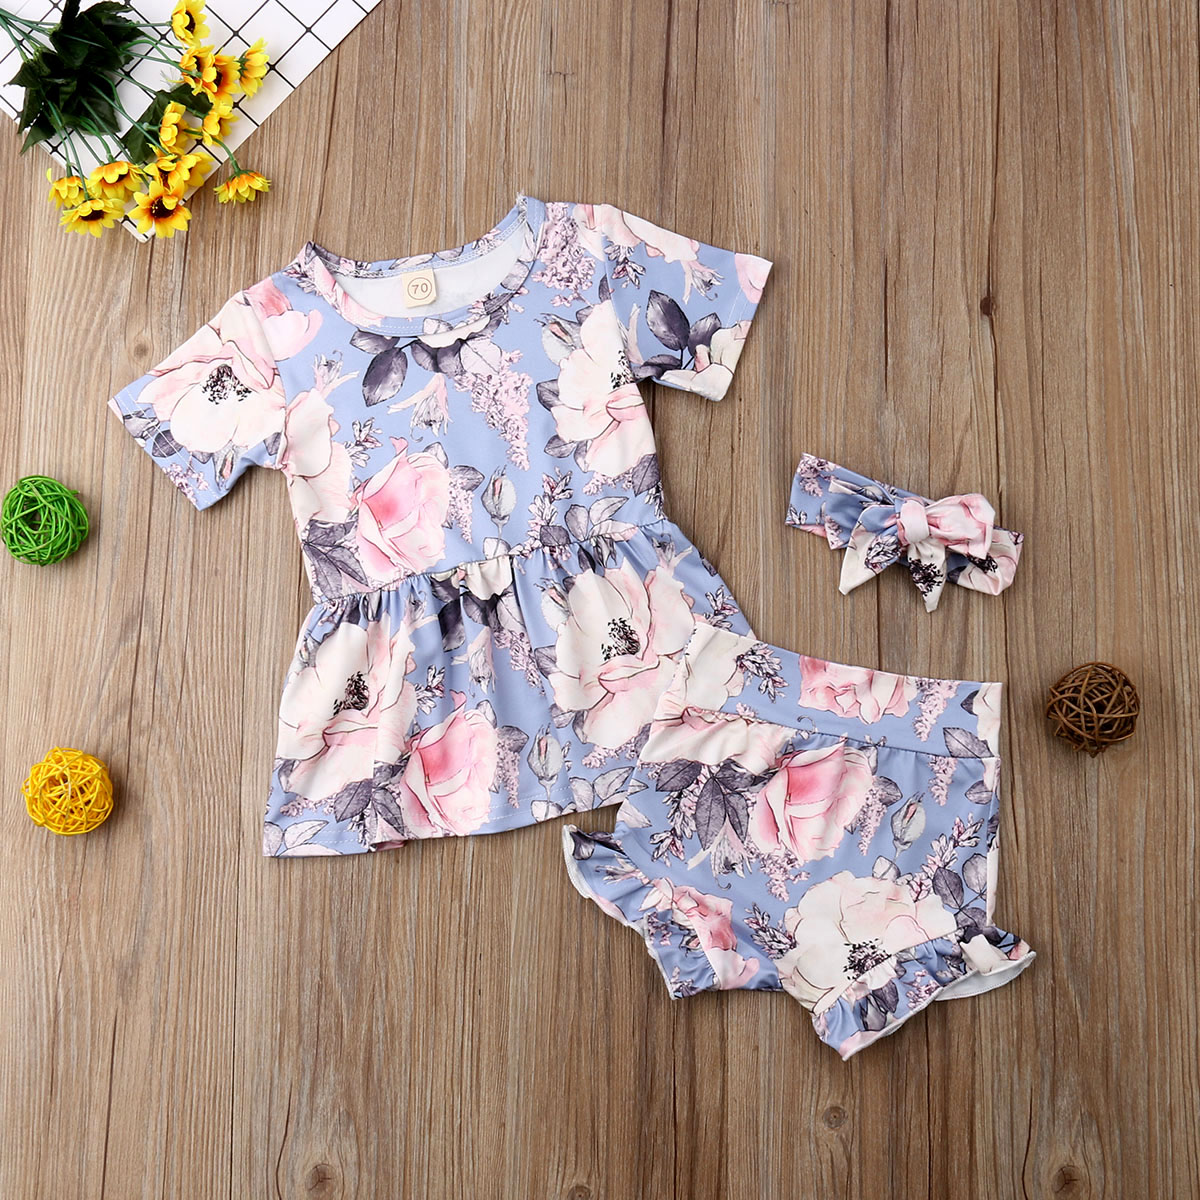 2pcs Toddler Kid Baby Girl Clothes Floral Ruffle T Shirt Tops Shorts Outfits Set